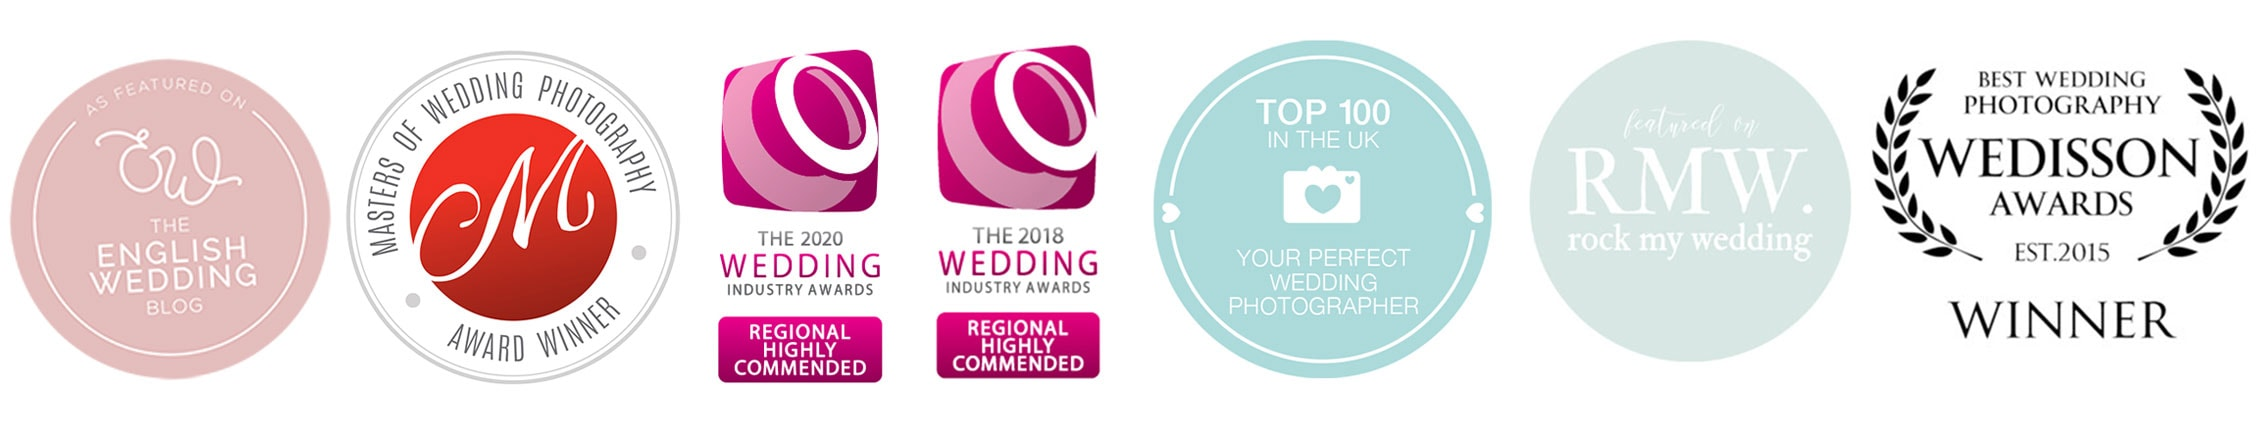 award winning West Midlands wedding photographer